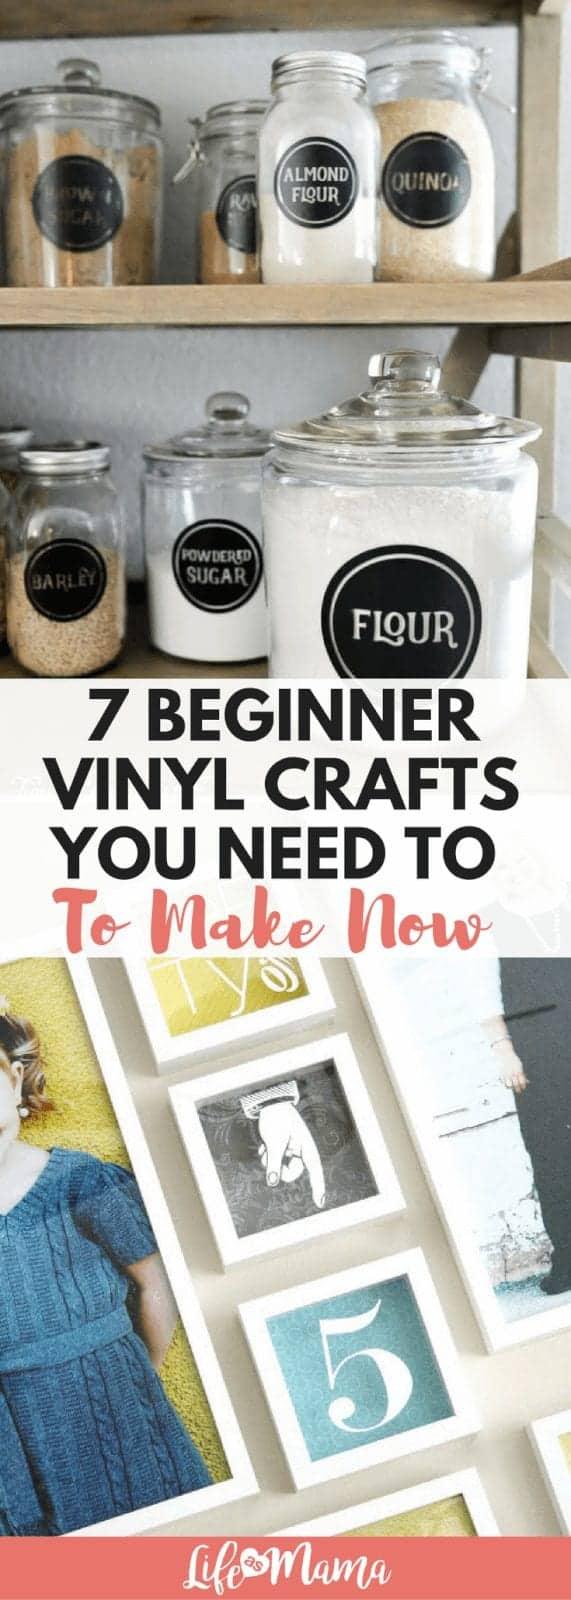 vinyl crafts